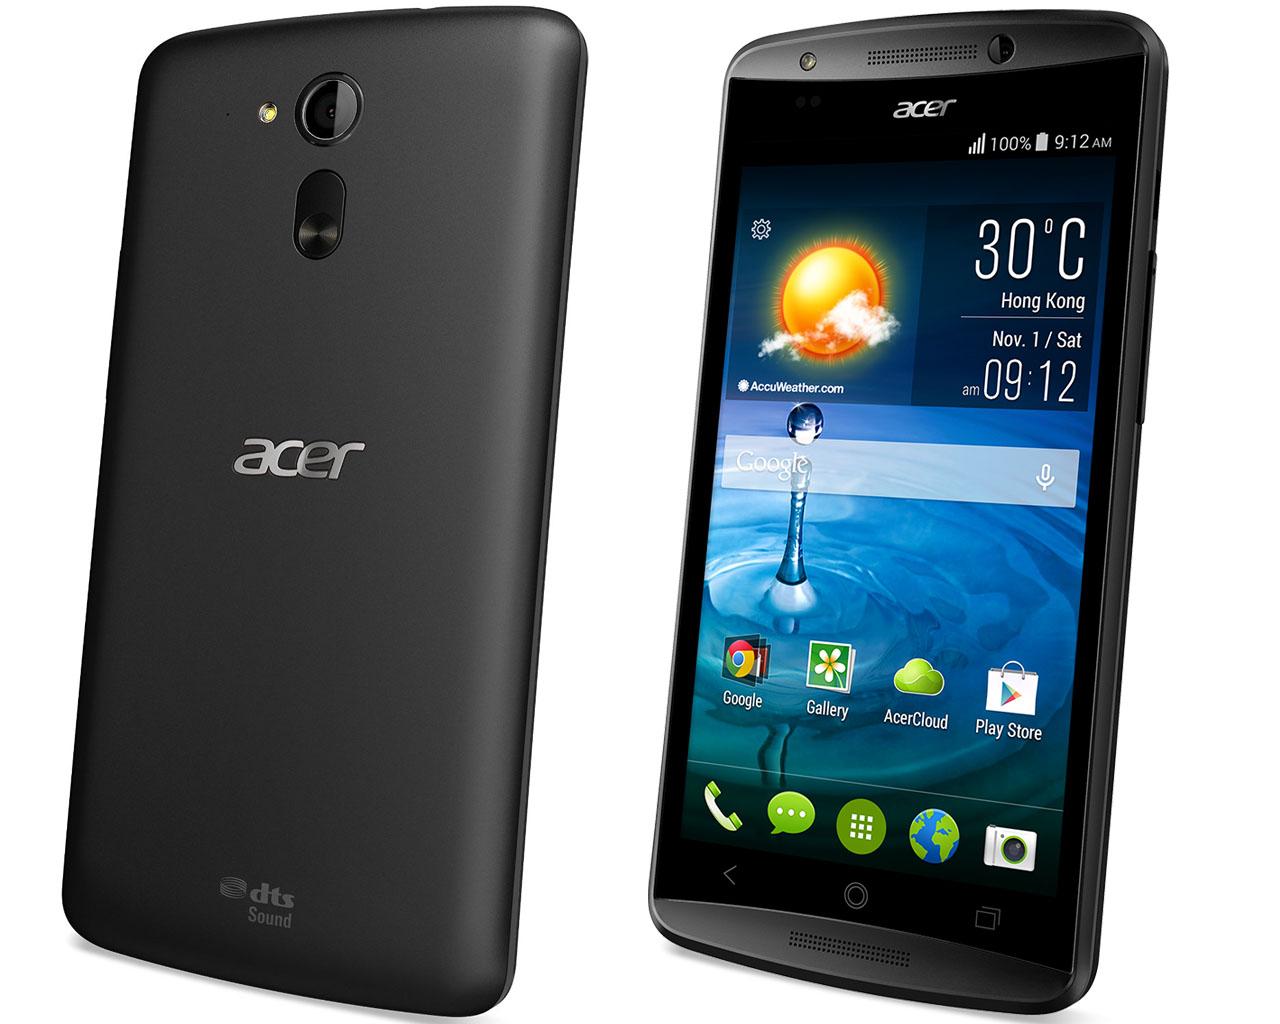 Breve Analisis Del Smartphone Acer Liquid E700 Trio